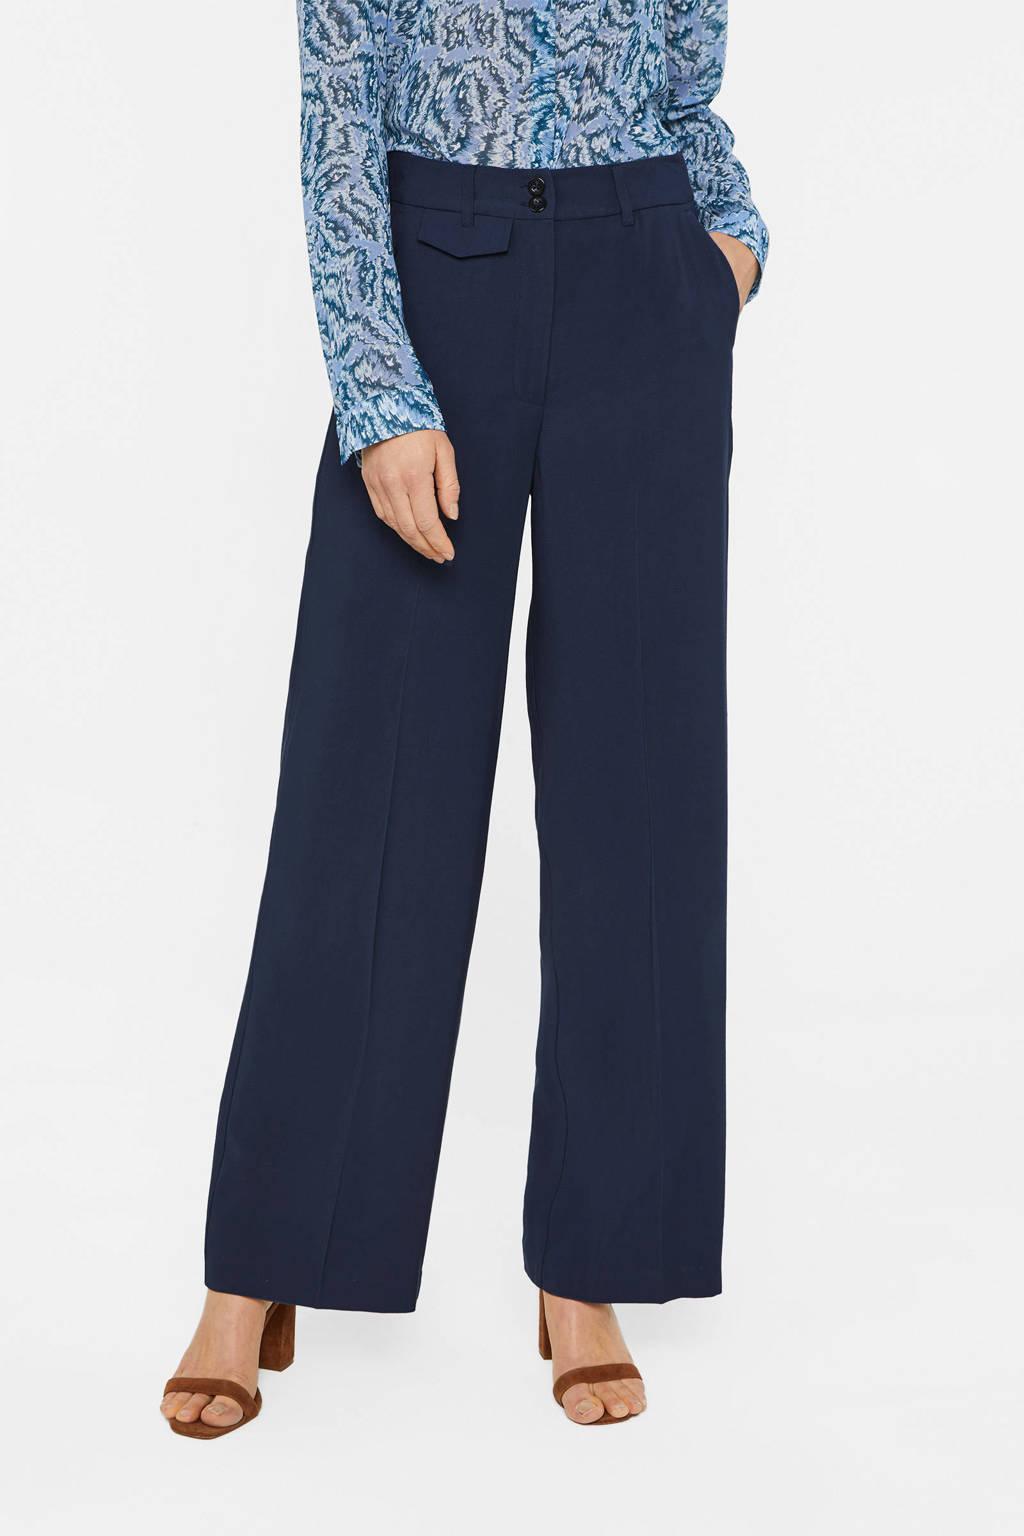 WE Fashion high waist loose fit broek donkerblauw, Donkerblauw